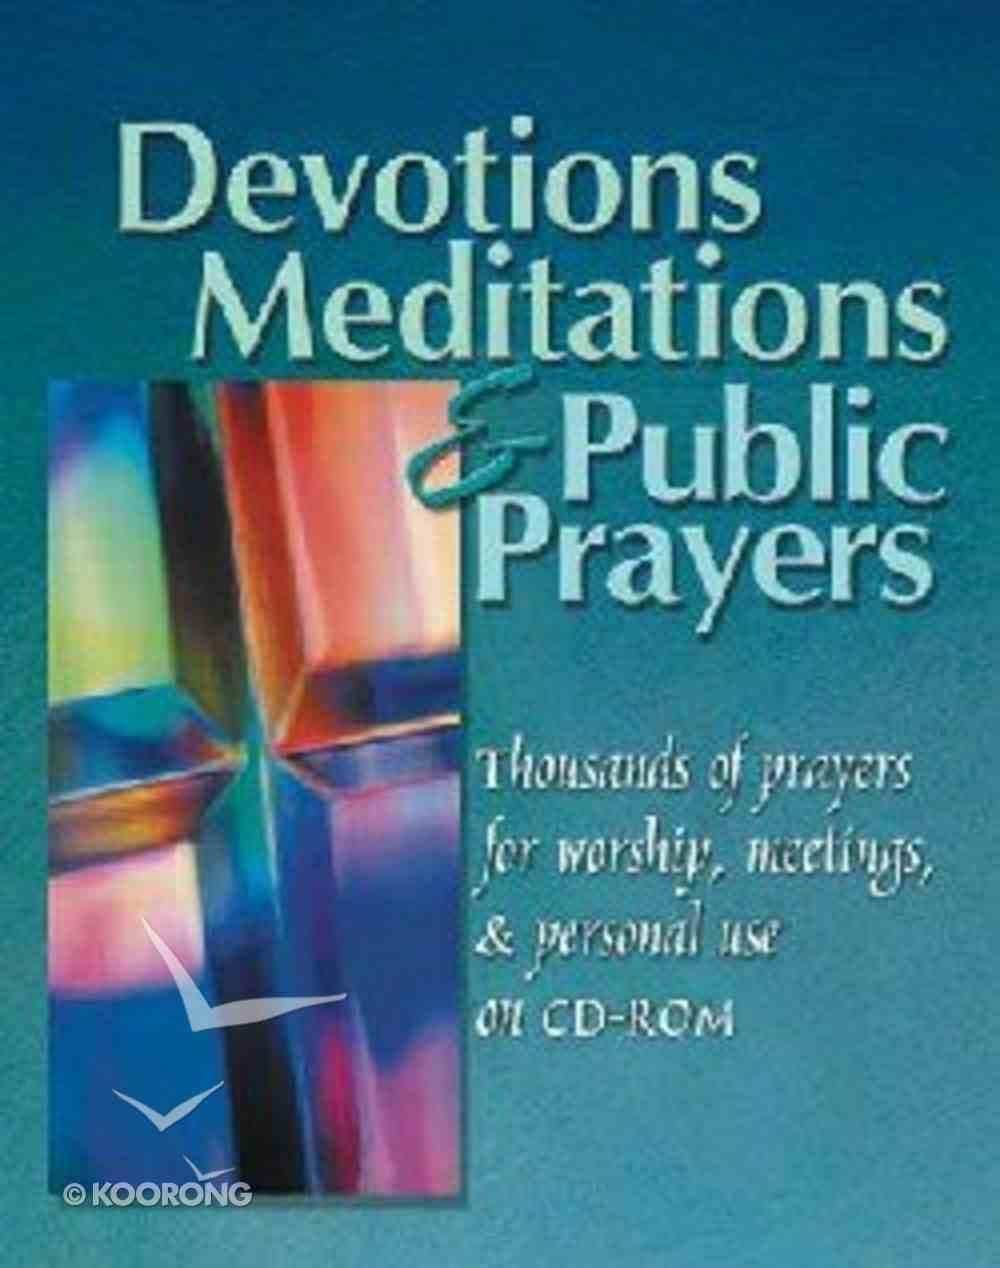 Devotions, Meditations & Public Prayers (Cdrom) CD-rom